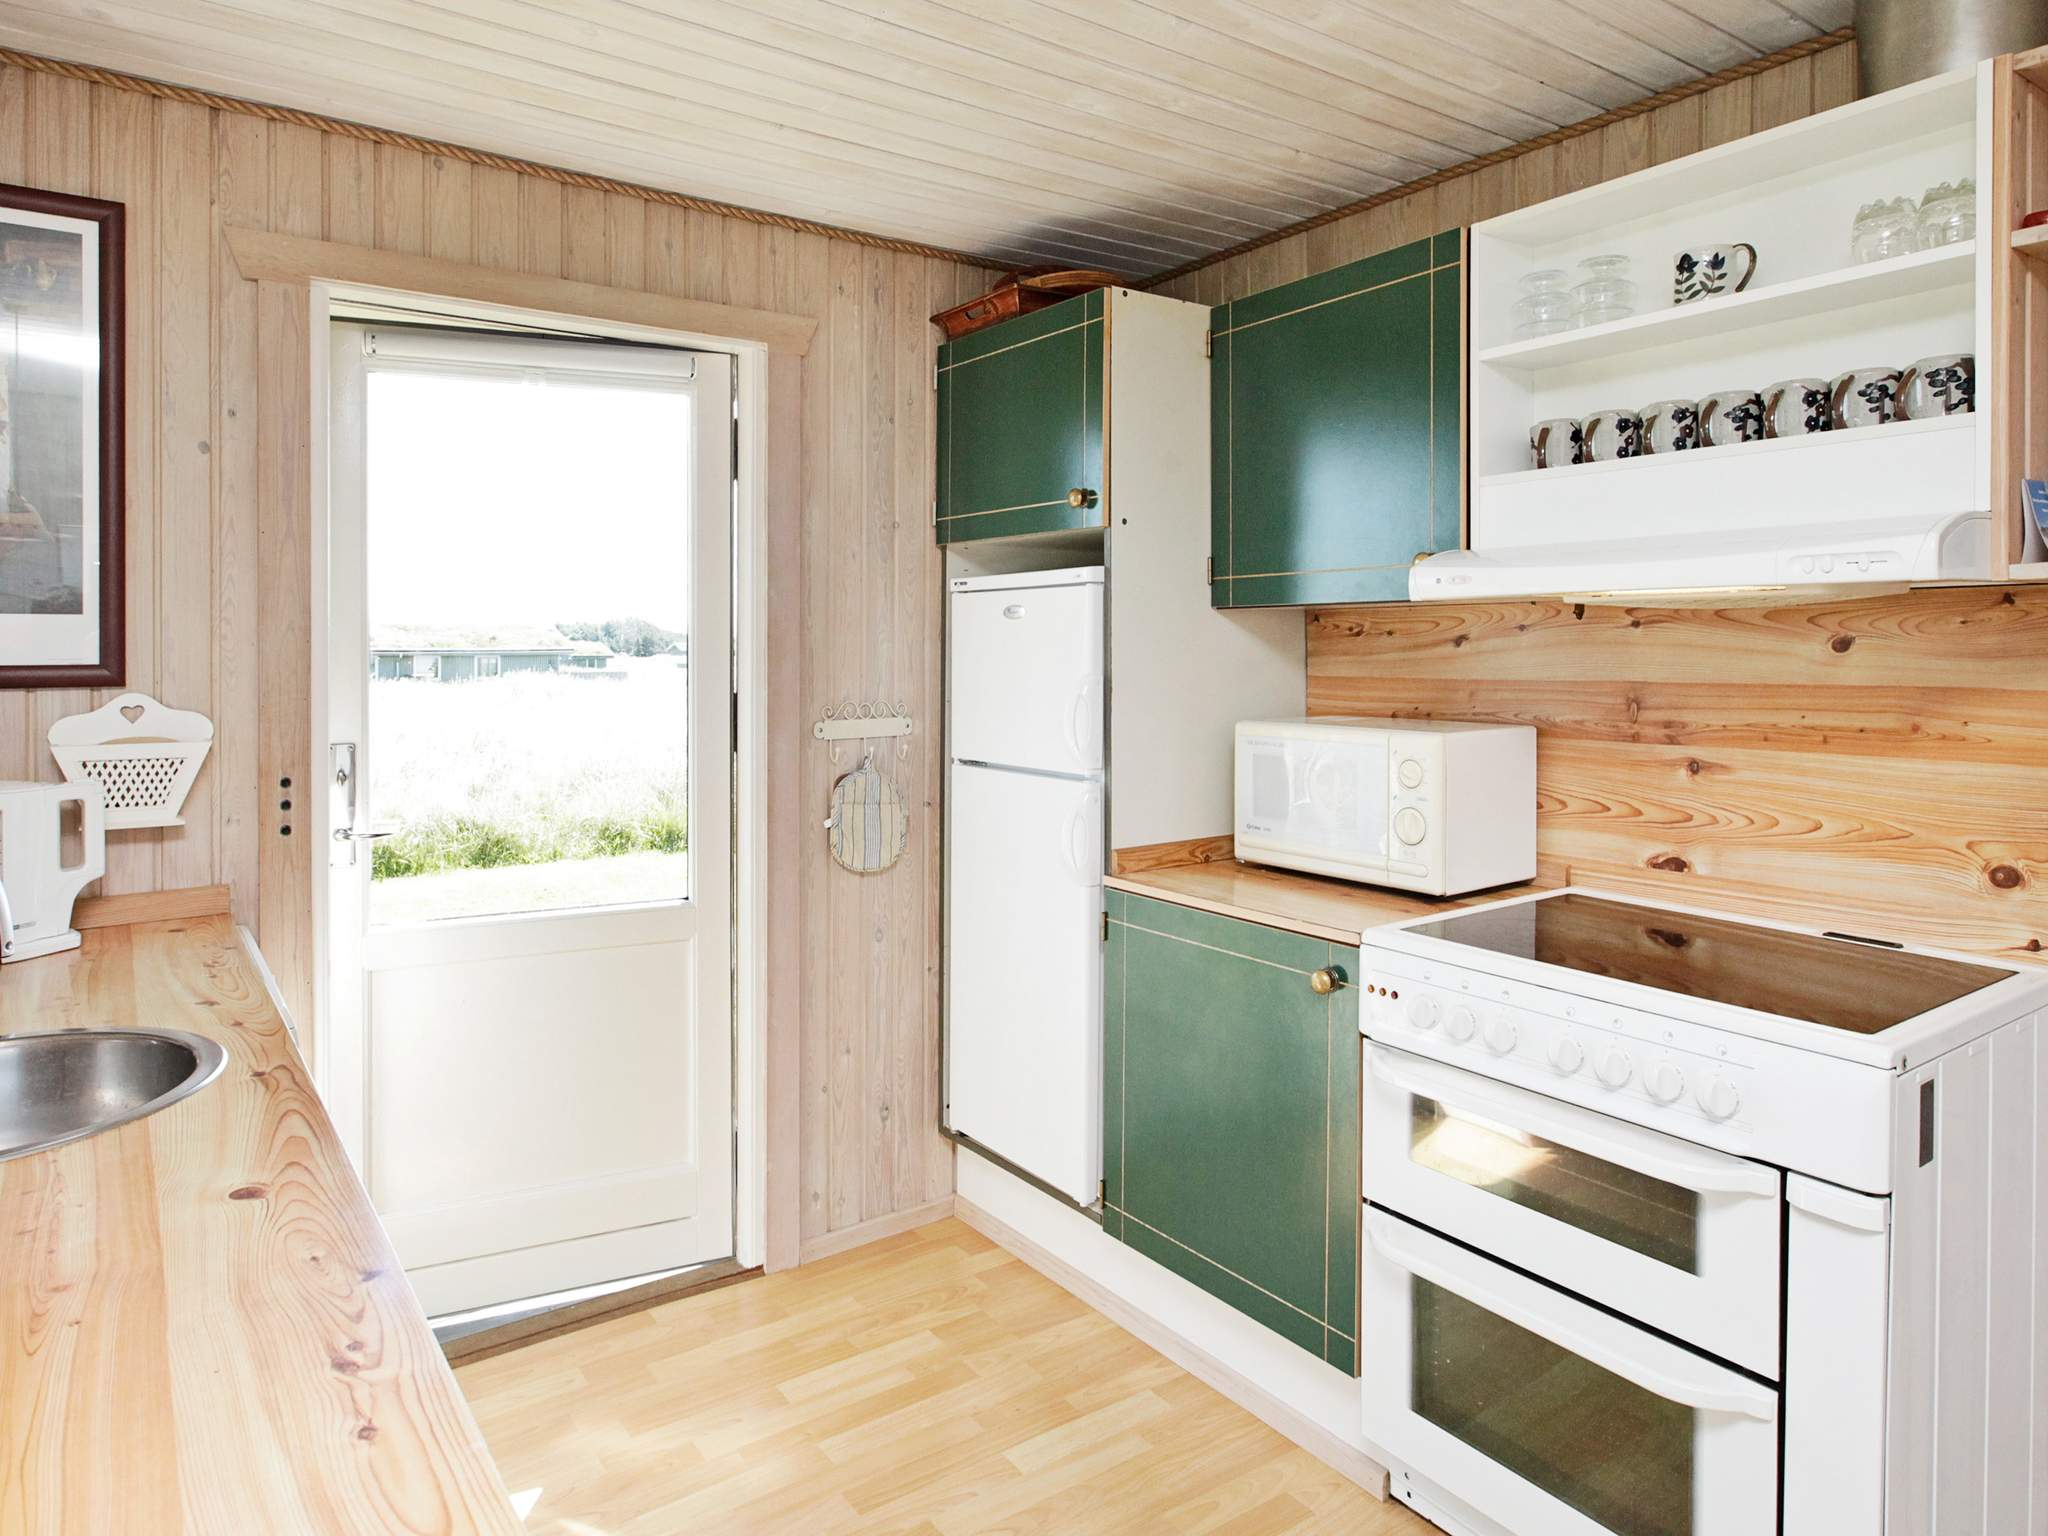 Ferienhaus Grønhøj Strand (83808), Løkken, , Nordwestjütland, Dänemark, Bild 8